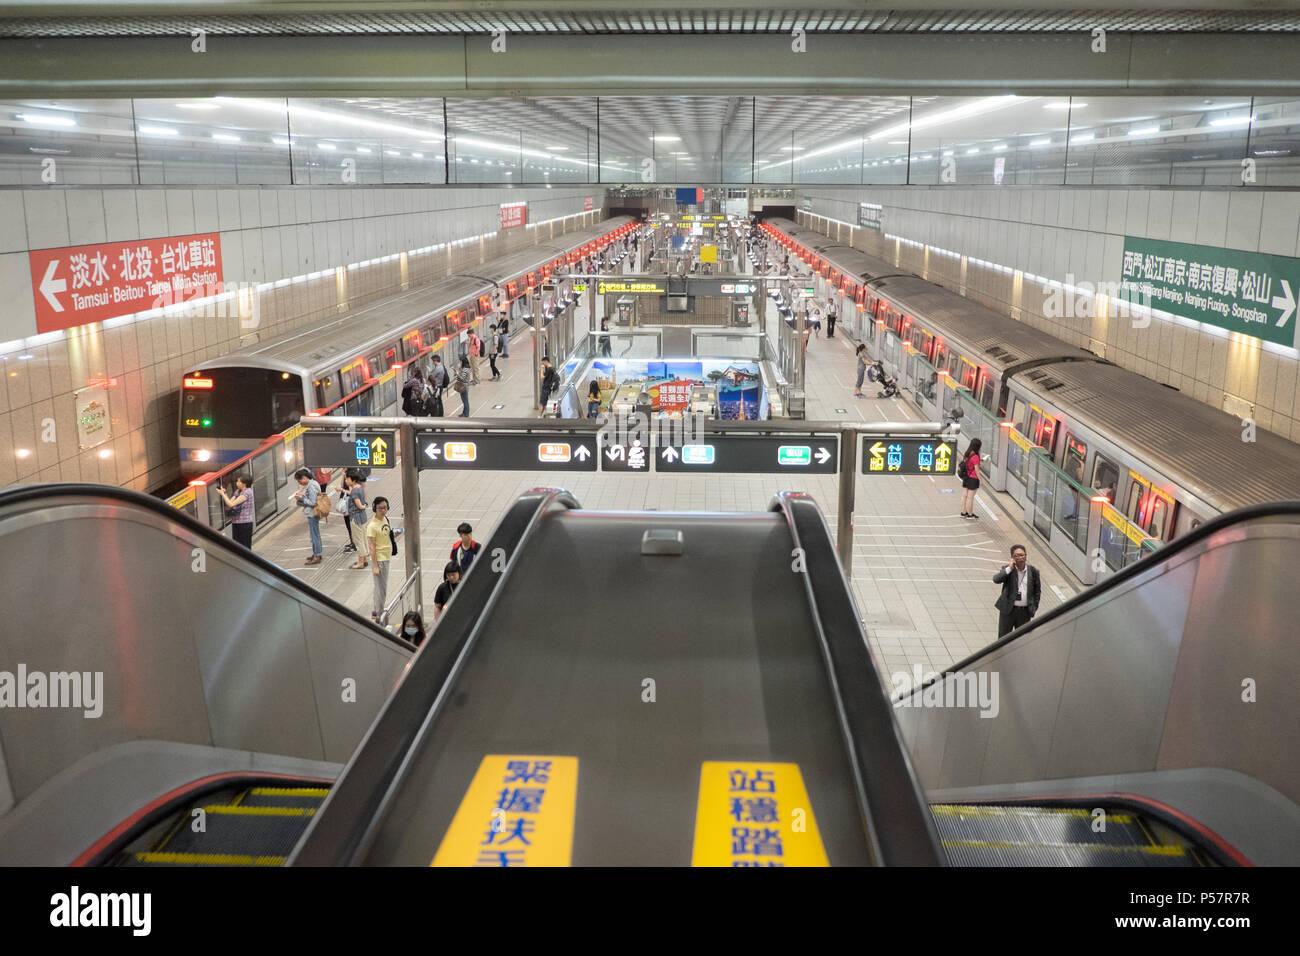 Train,transport,transportation,rail,railway,platform,Taipei